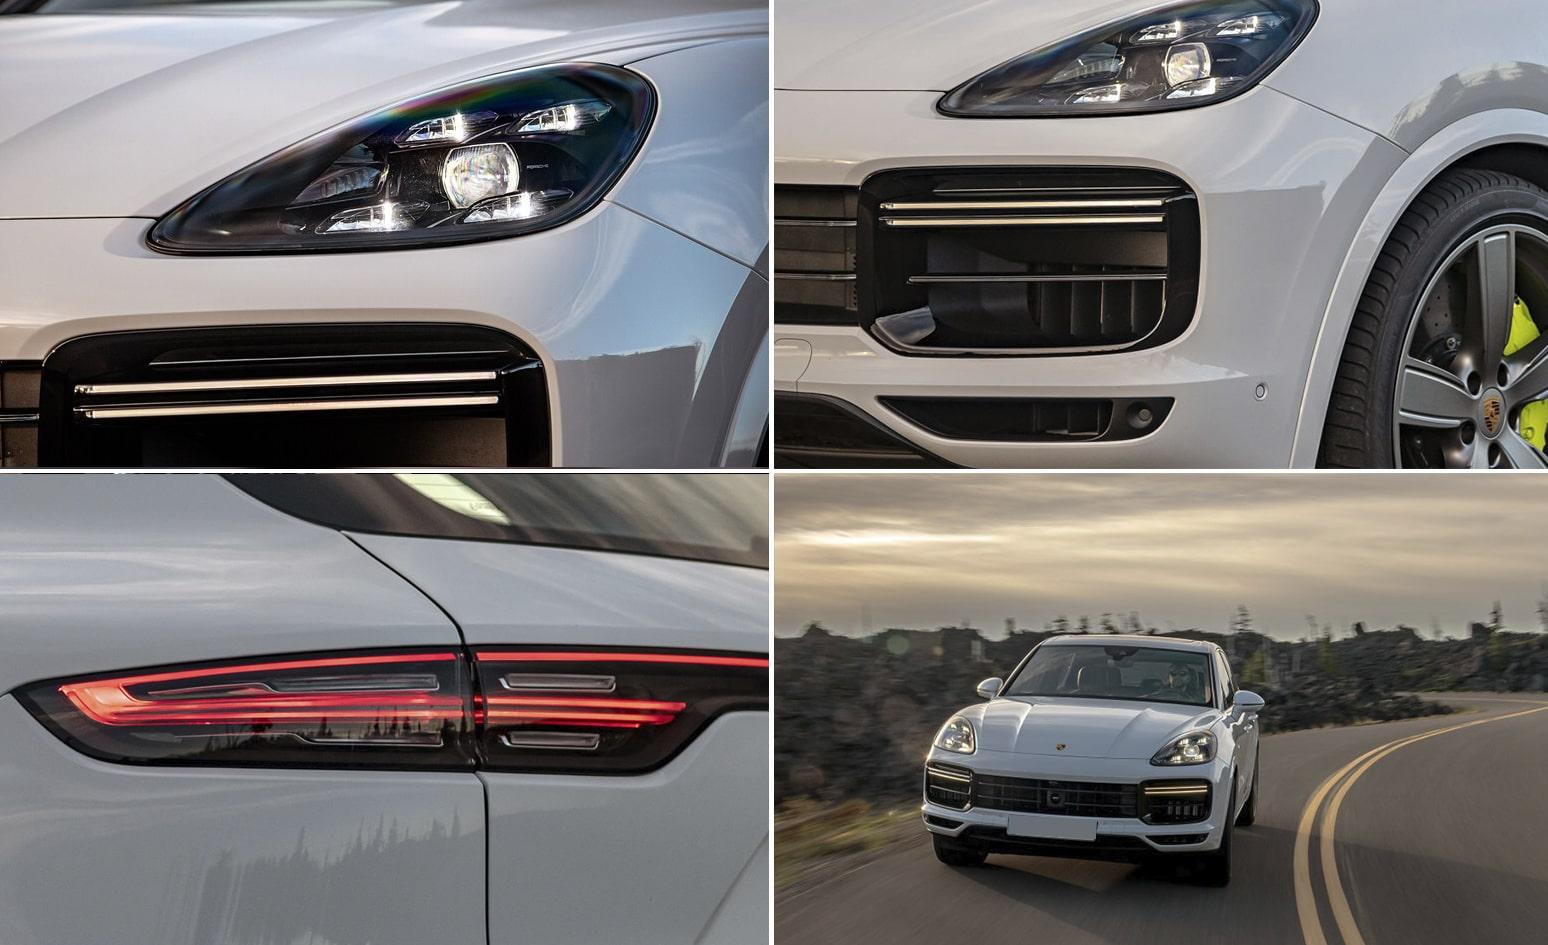 2019-porsche-cayenne-turbo-s-e-hybrid-min